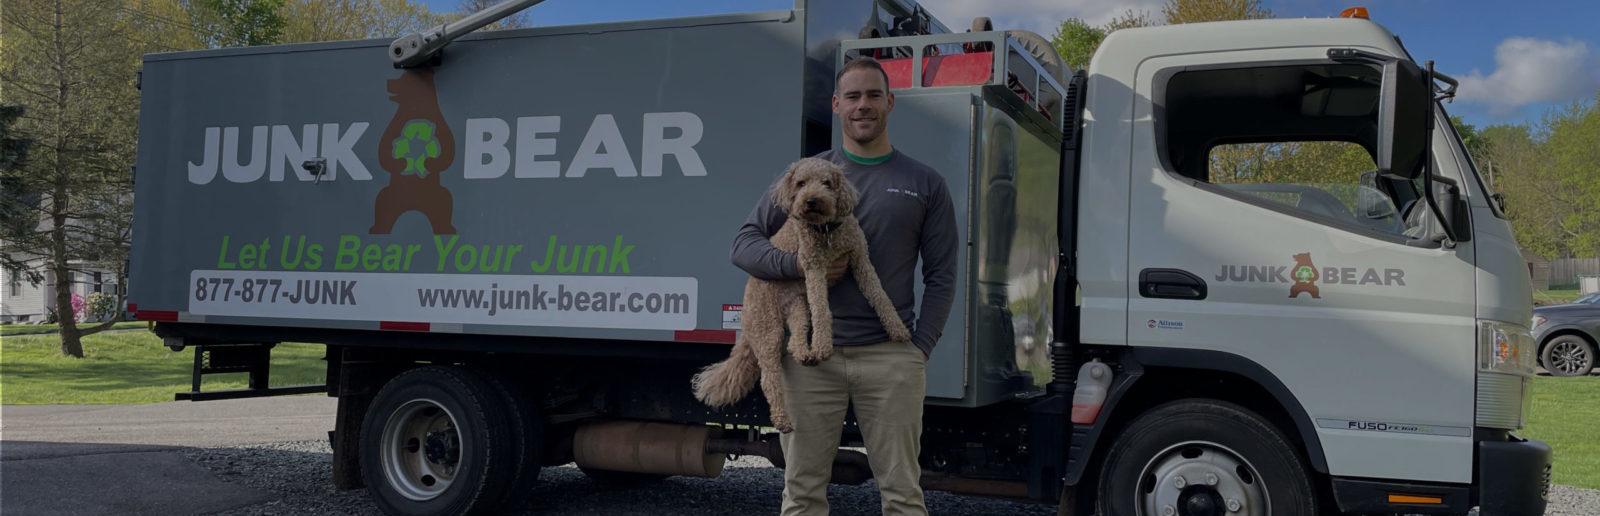 Junk Bear team member with dog